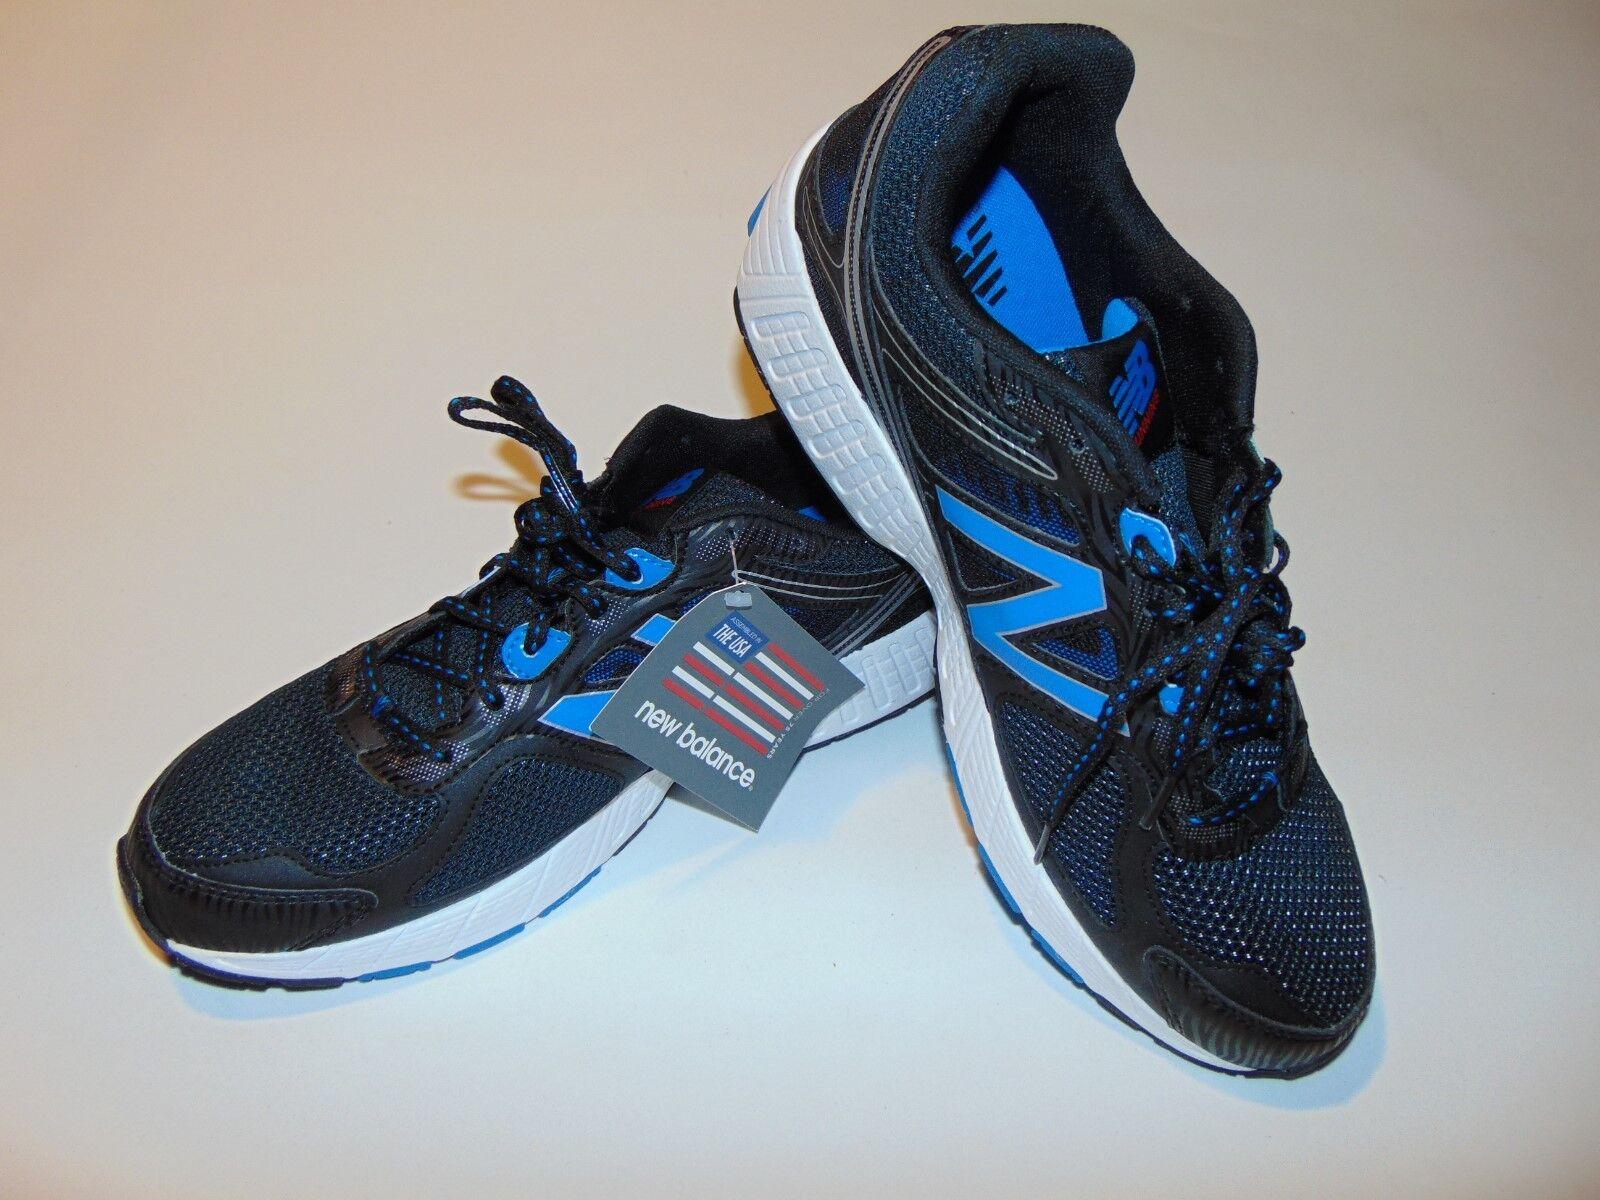 New Balance Balance Balance M670   Round Toe Synthetic  Tennis Shoe ~ SZ 10 D 0441f7